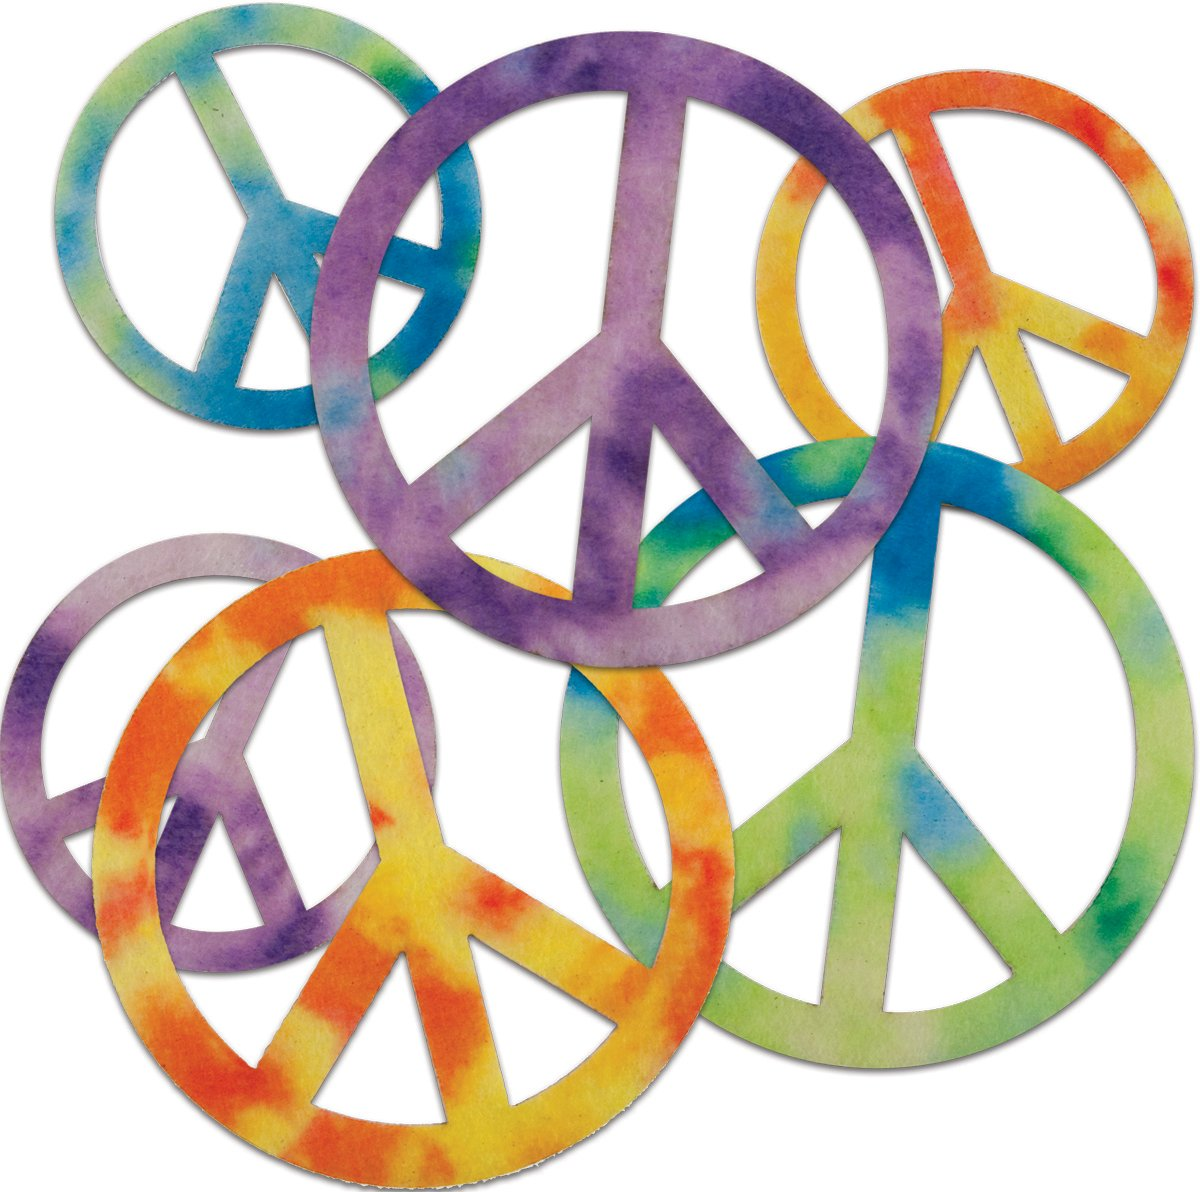 New Image Group 465964 Stick It Felt Shapes 24-Pkg-Peace Signs B0053AV16O